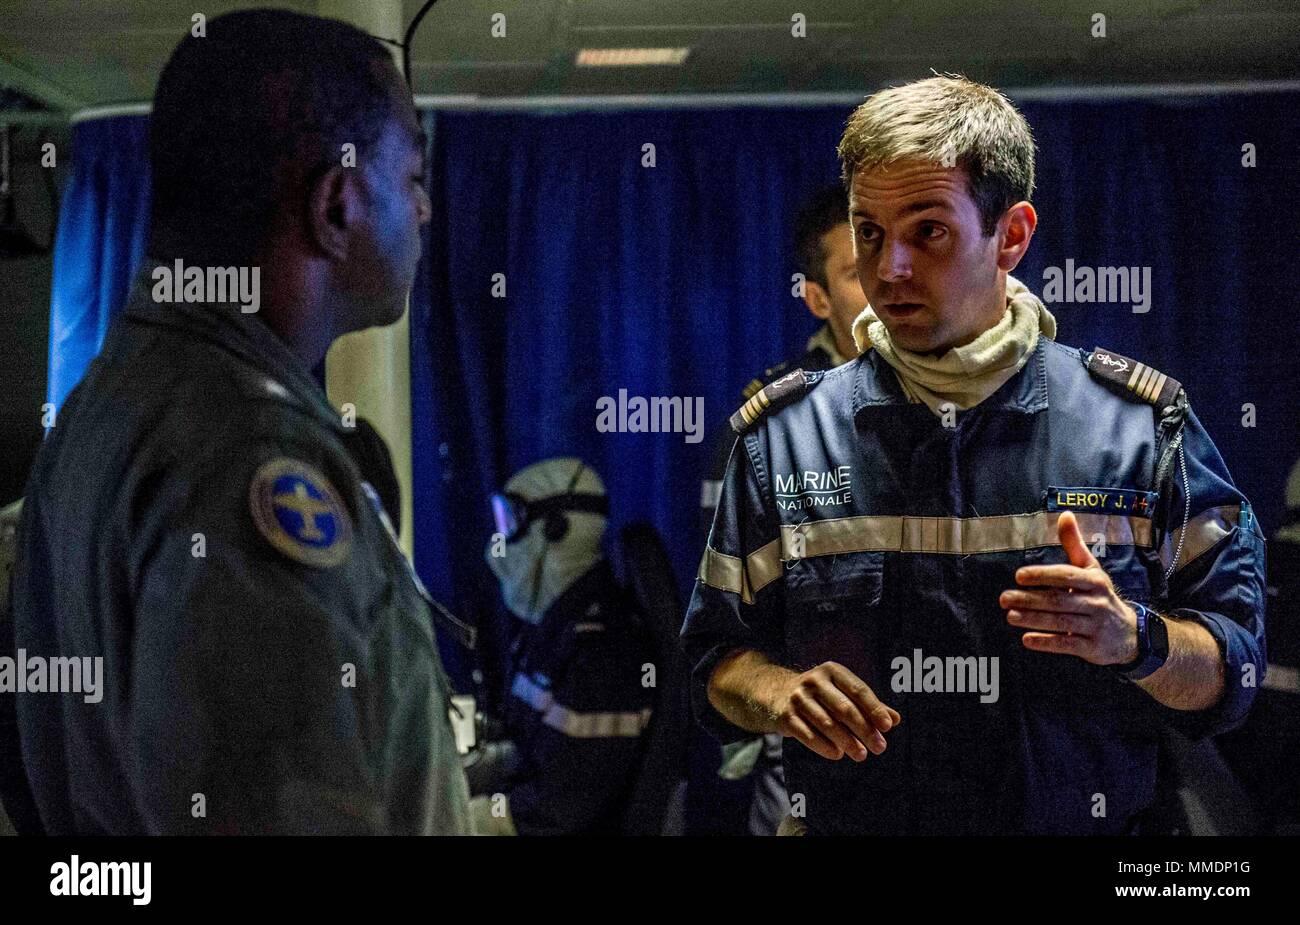 171018 N Ng136 114 Atlantic Ocean Oct 18 2017 Commander